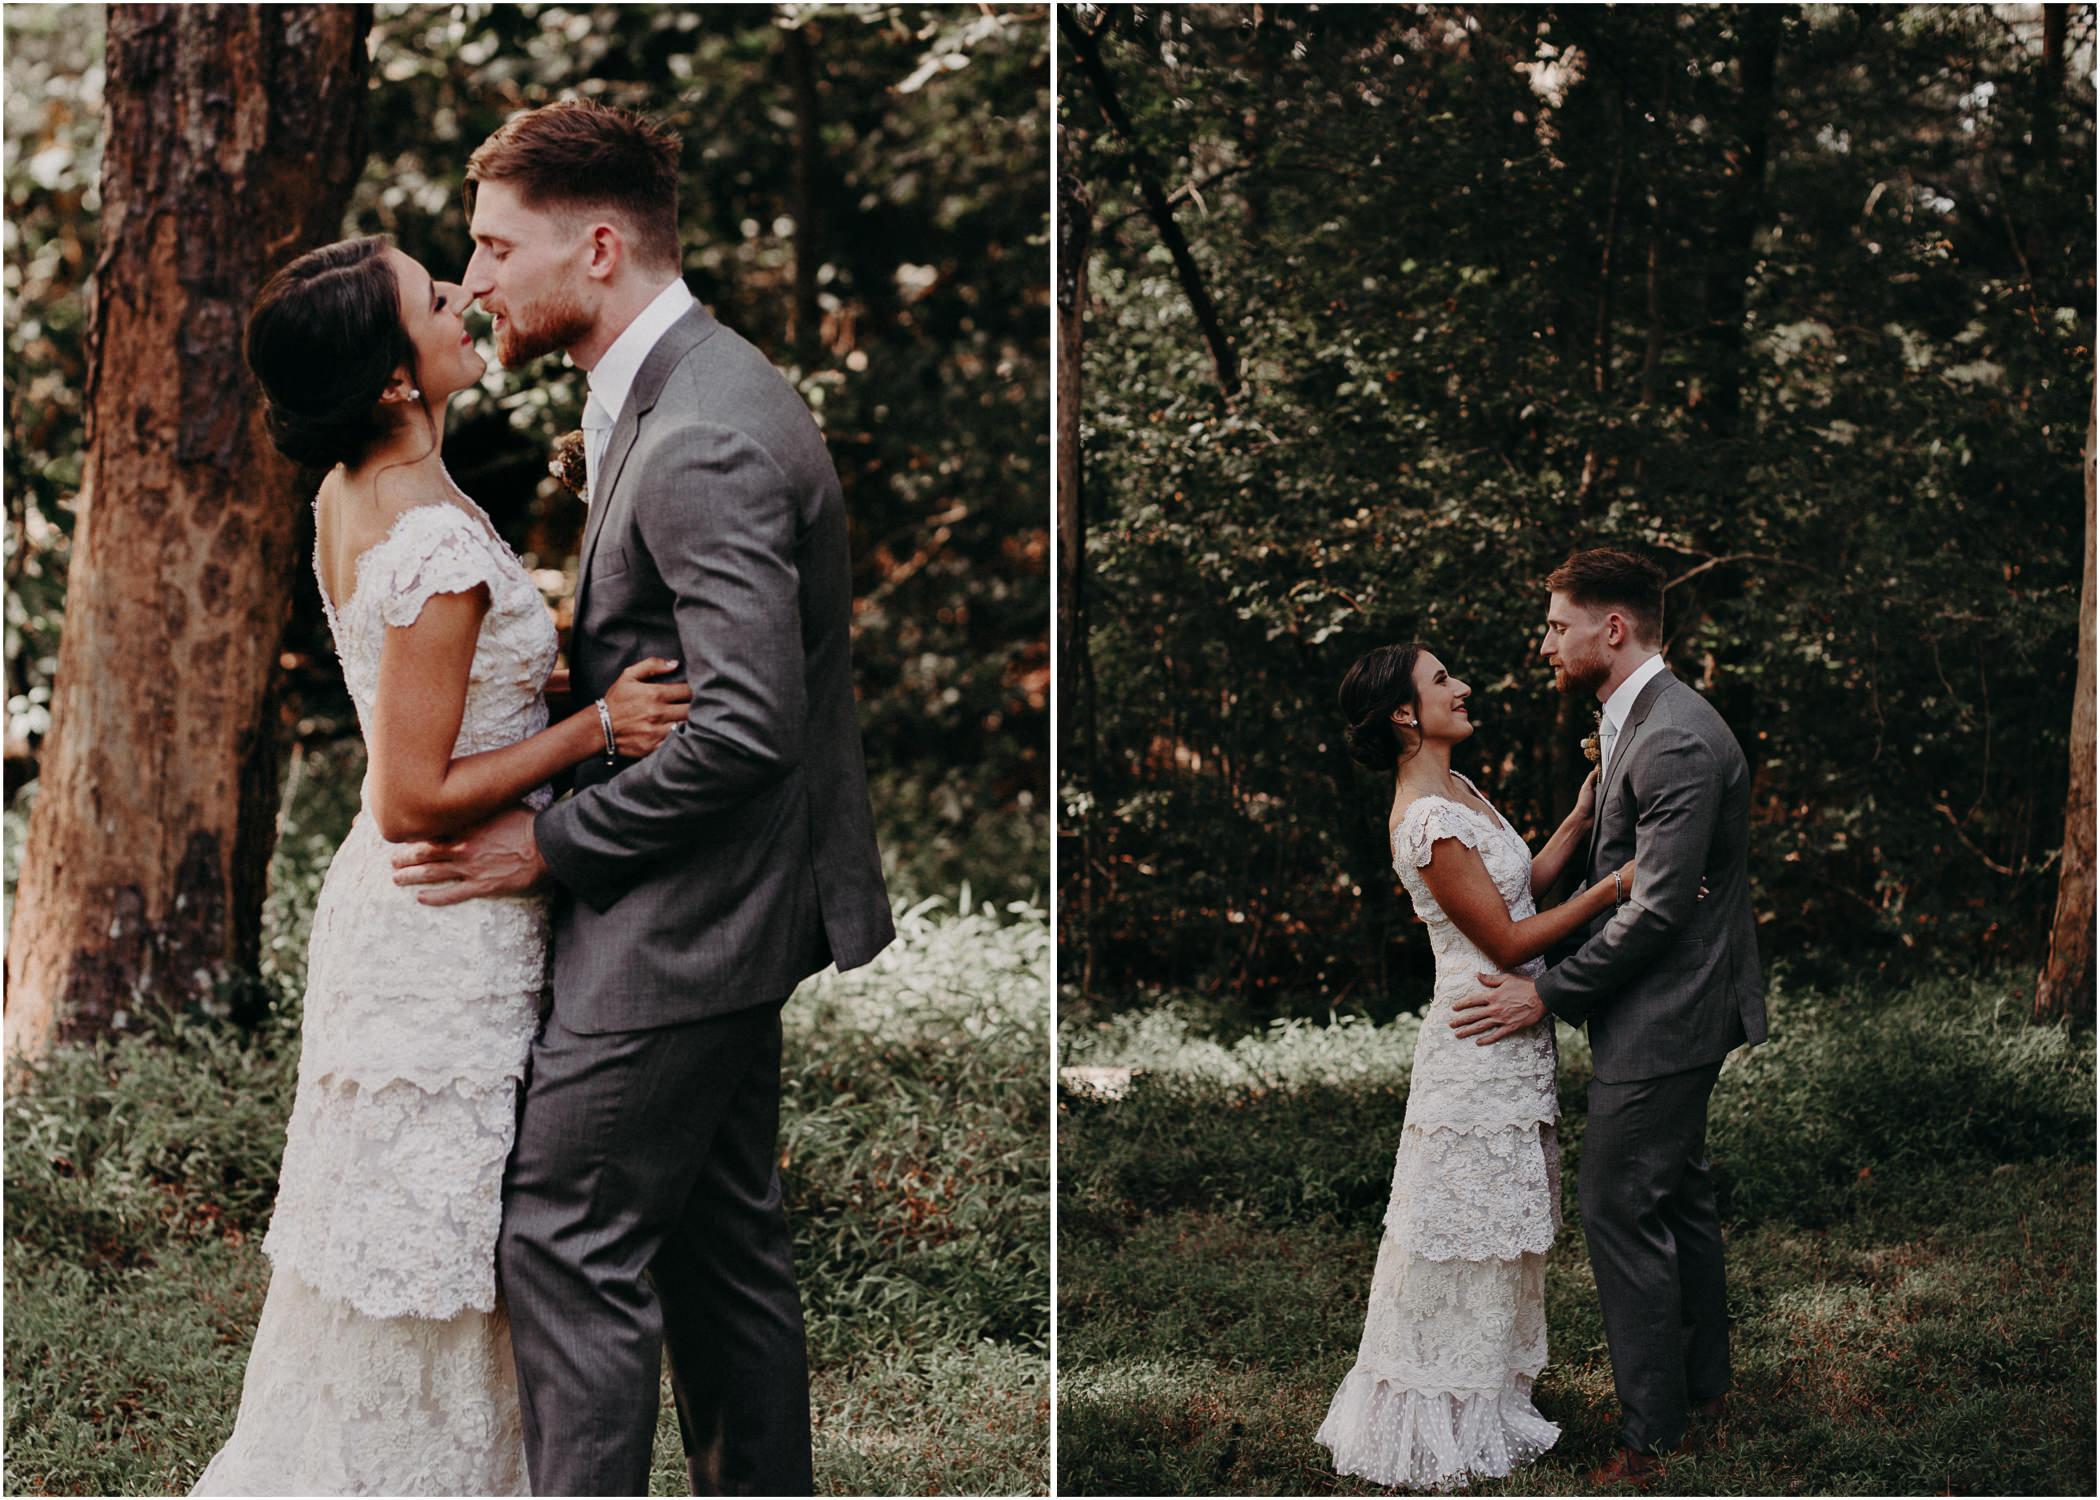 38 Bride & Groom first look before the ceremony on wedding day - Atlanta Wedding Photographer .jpg